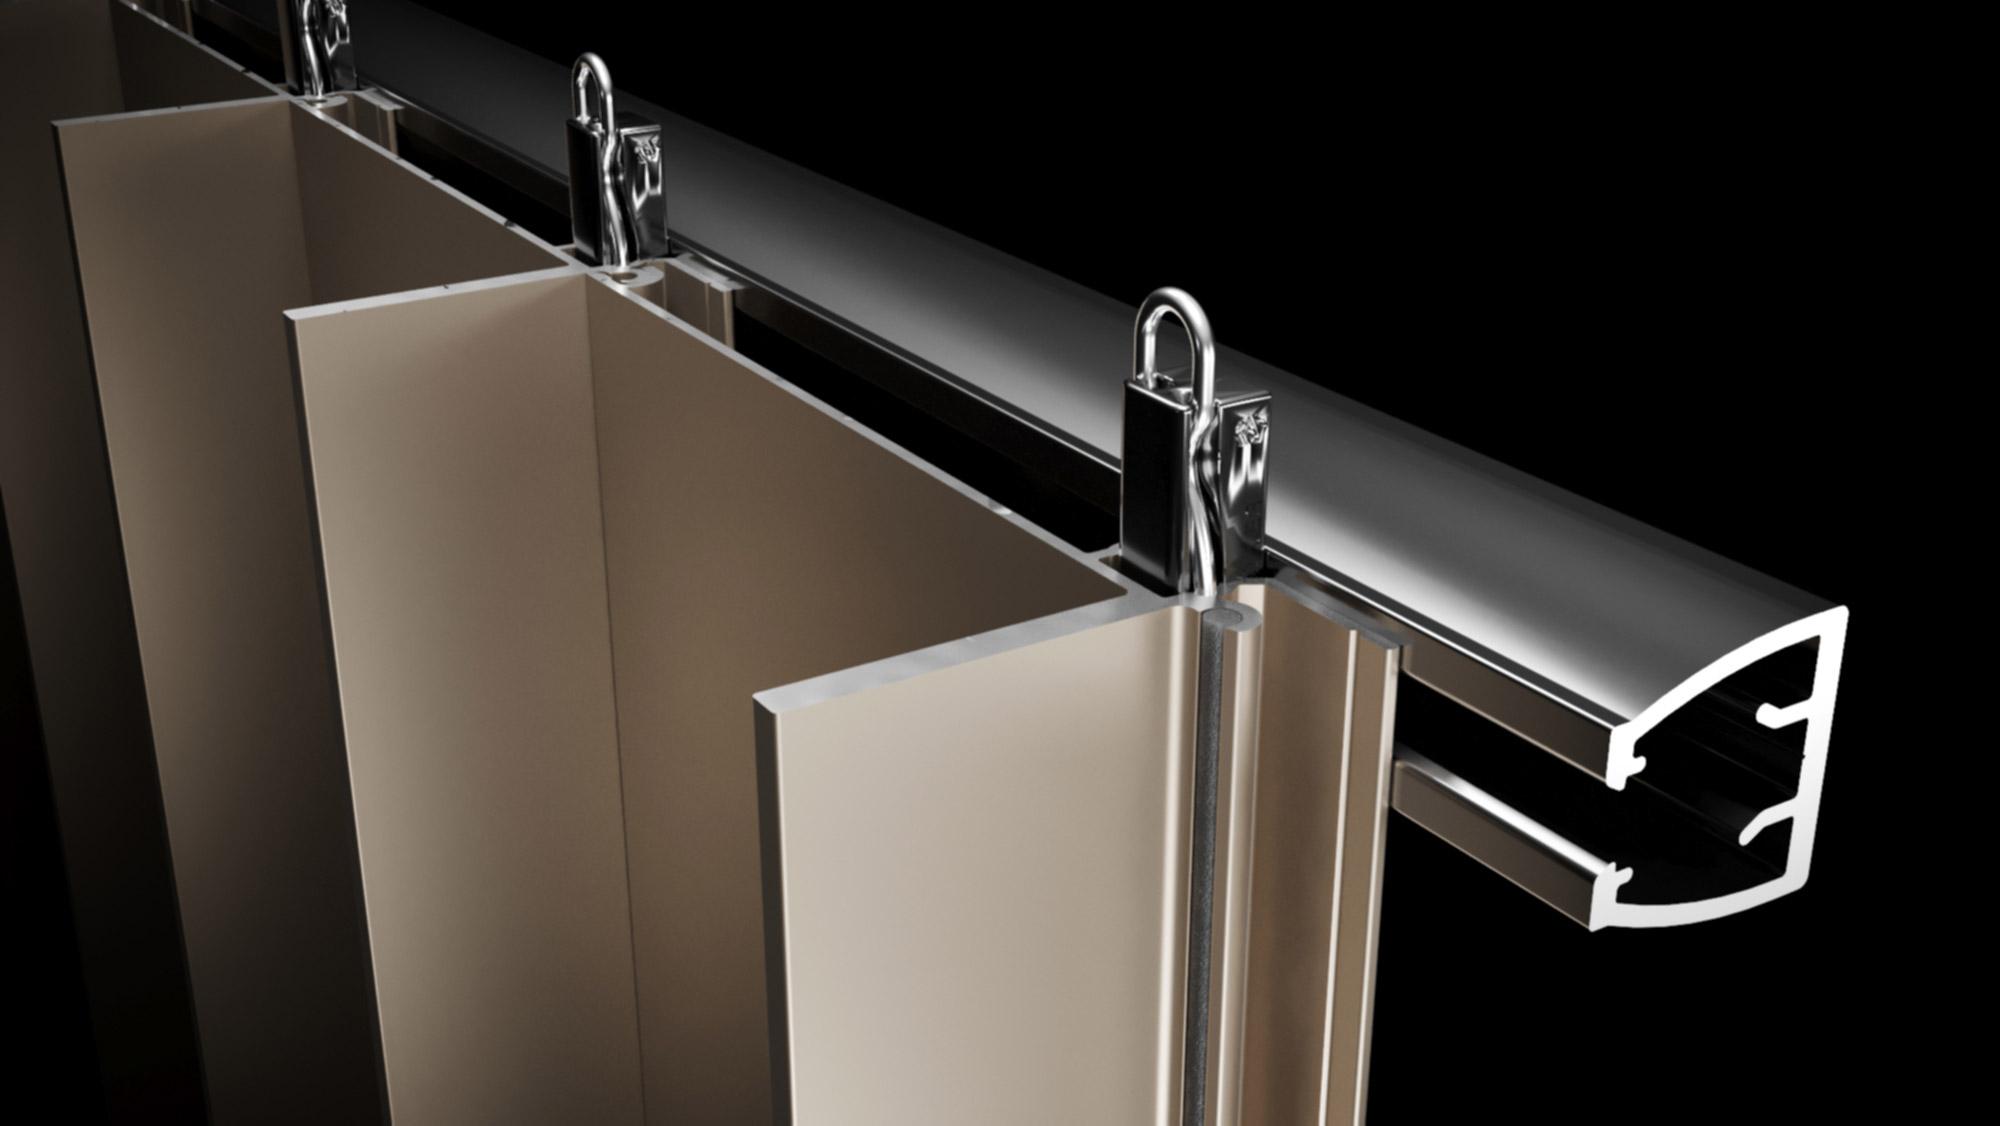 Sculptform Aluminium Click-on Cladding edge profile